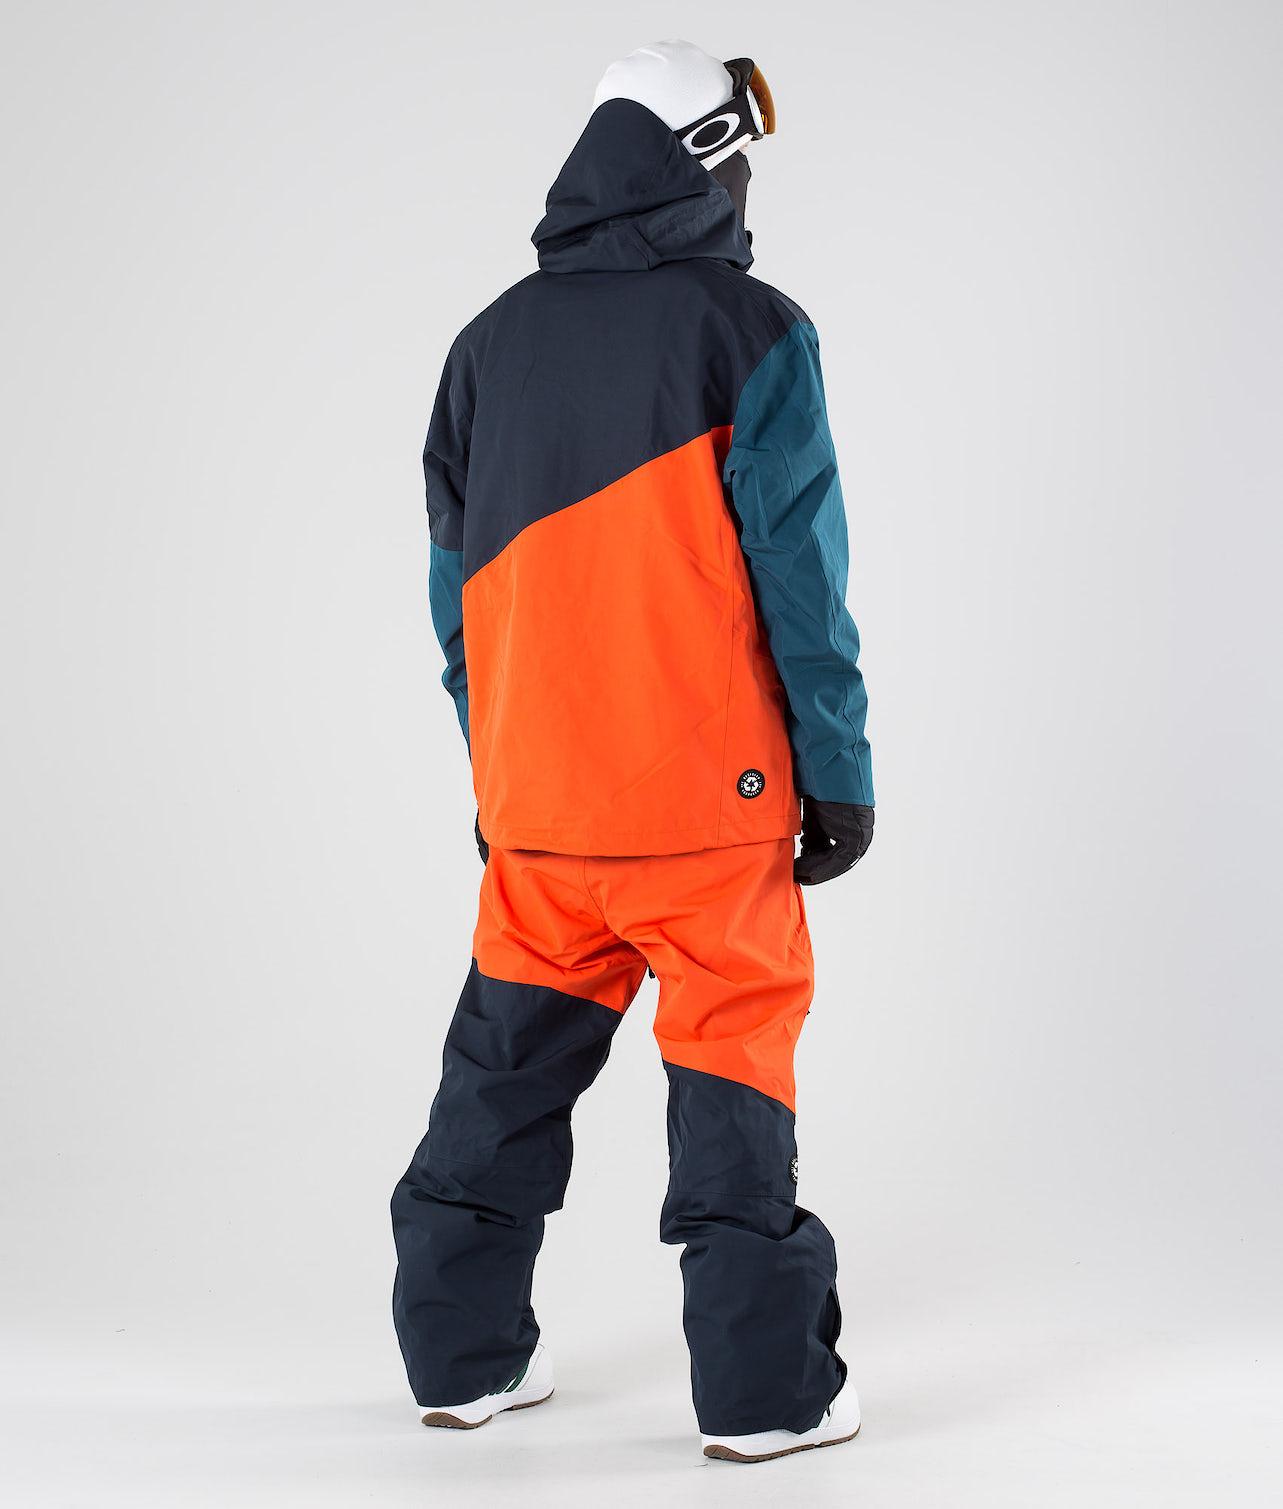 Picture Alpin Lumilautailutakki Orange Dark Blue